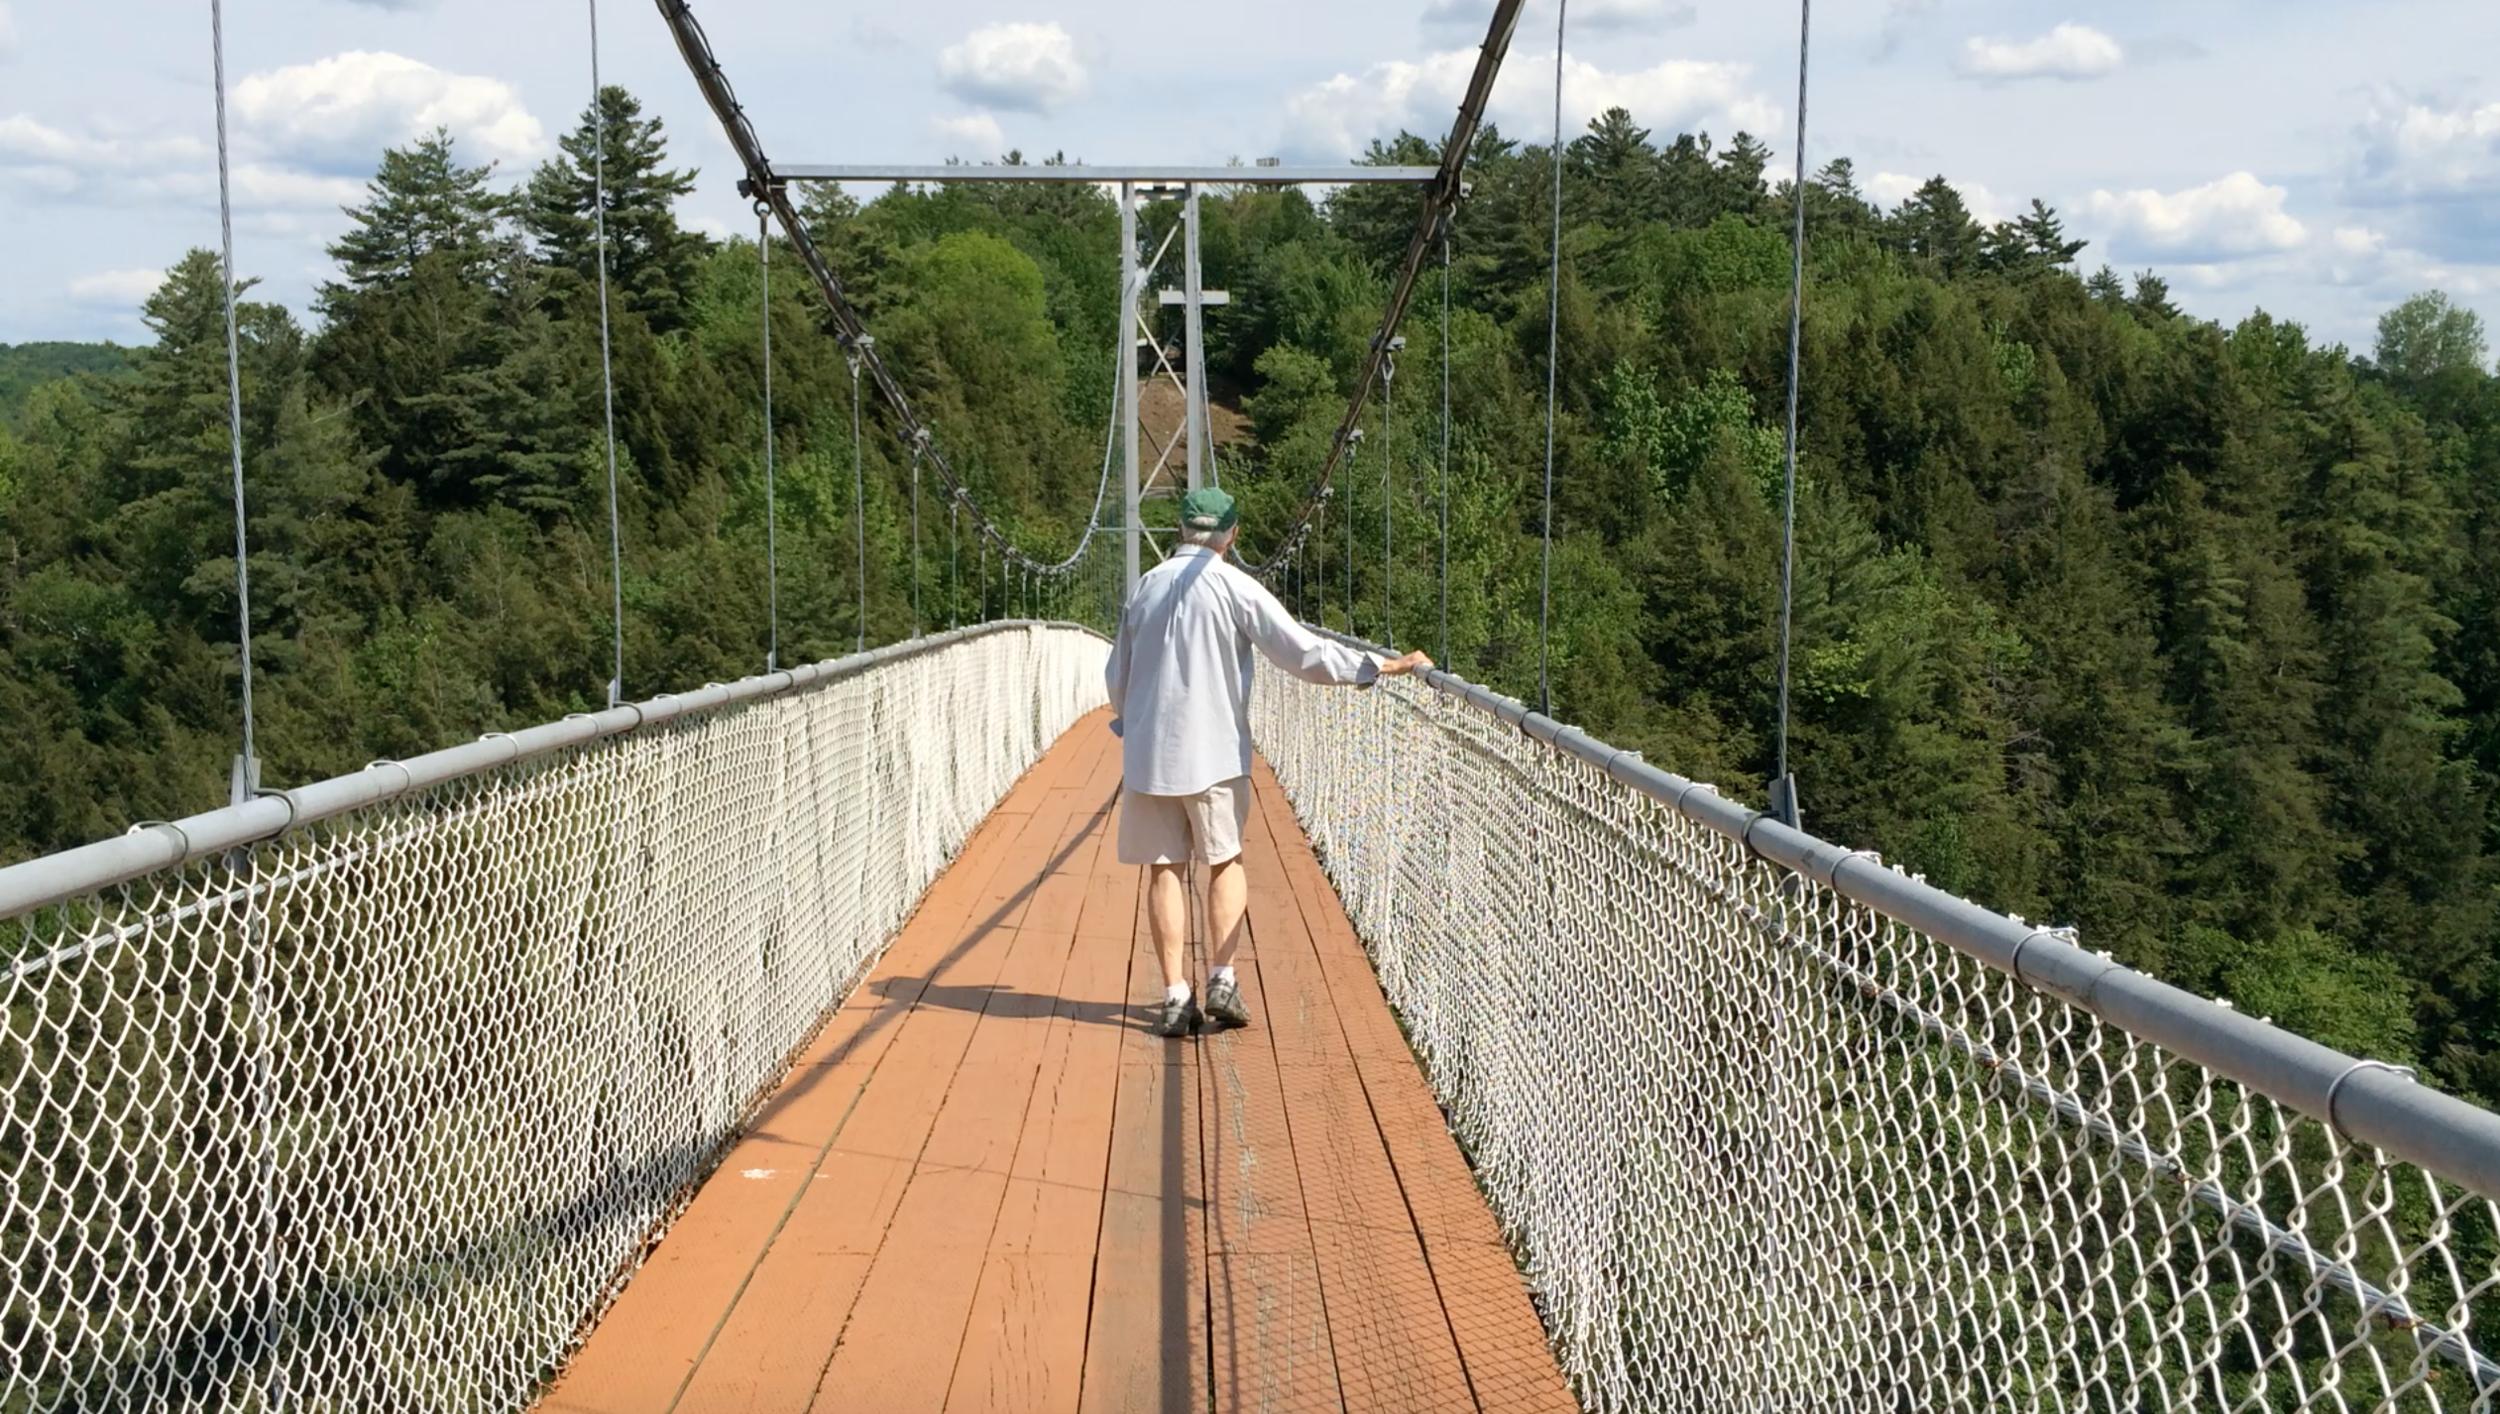 ray-worlds-longest-suspension-bridge.jpg .png